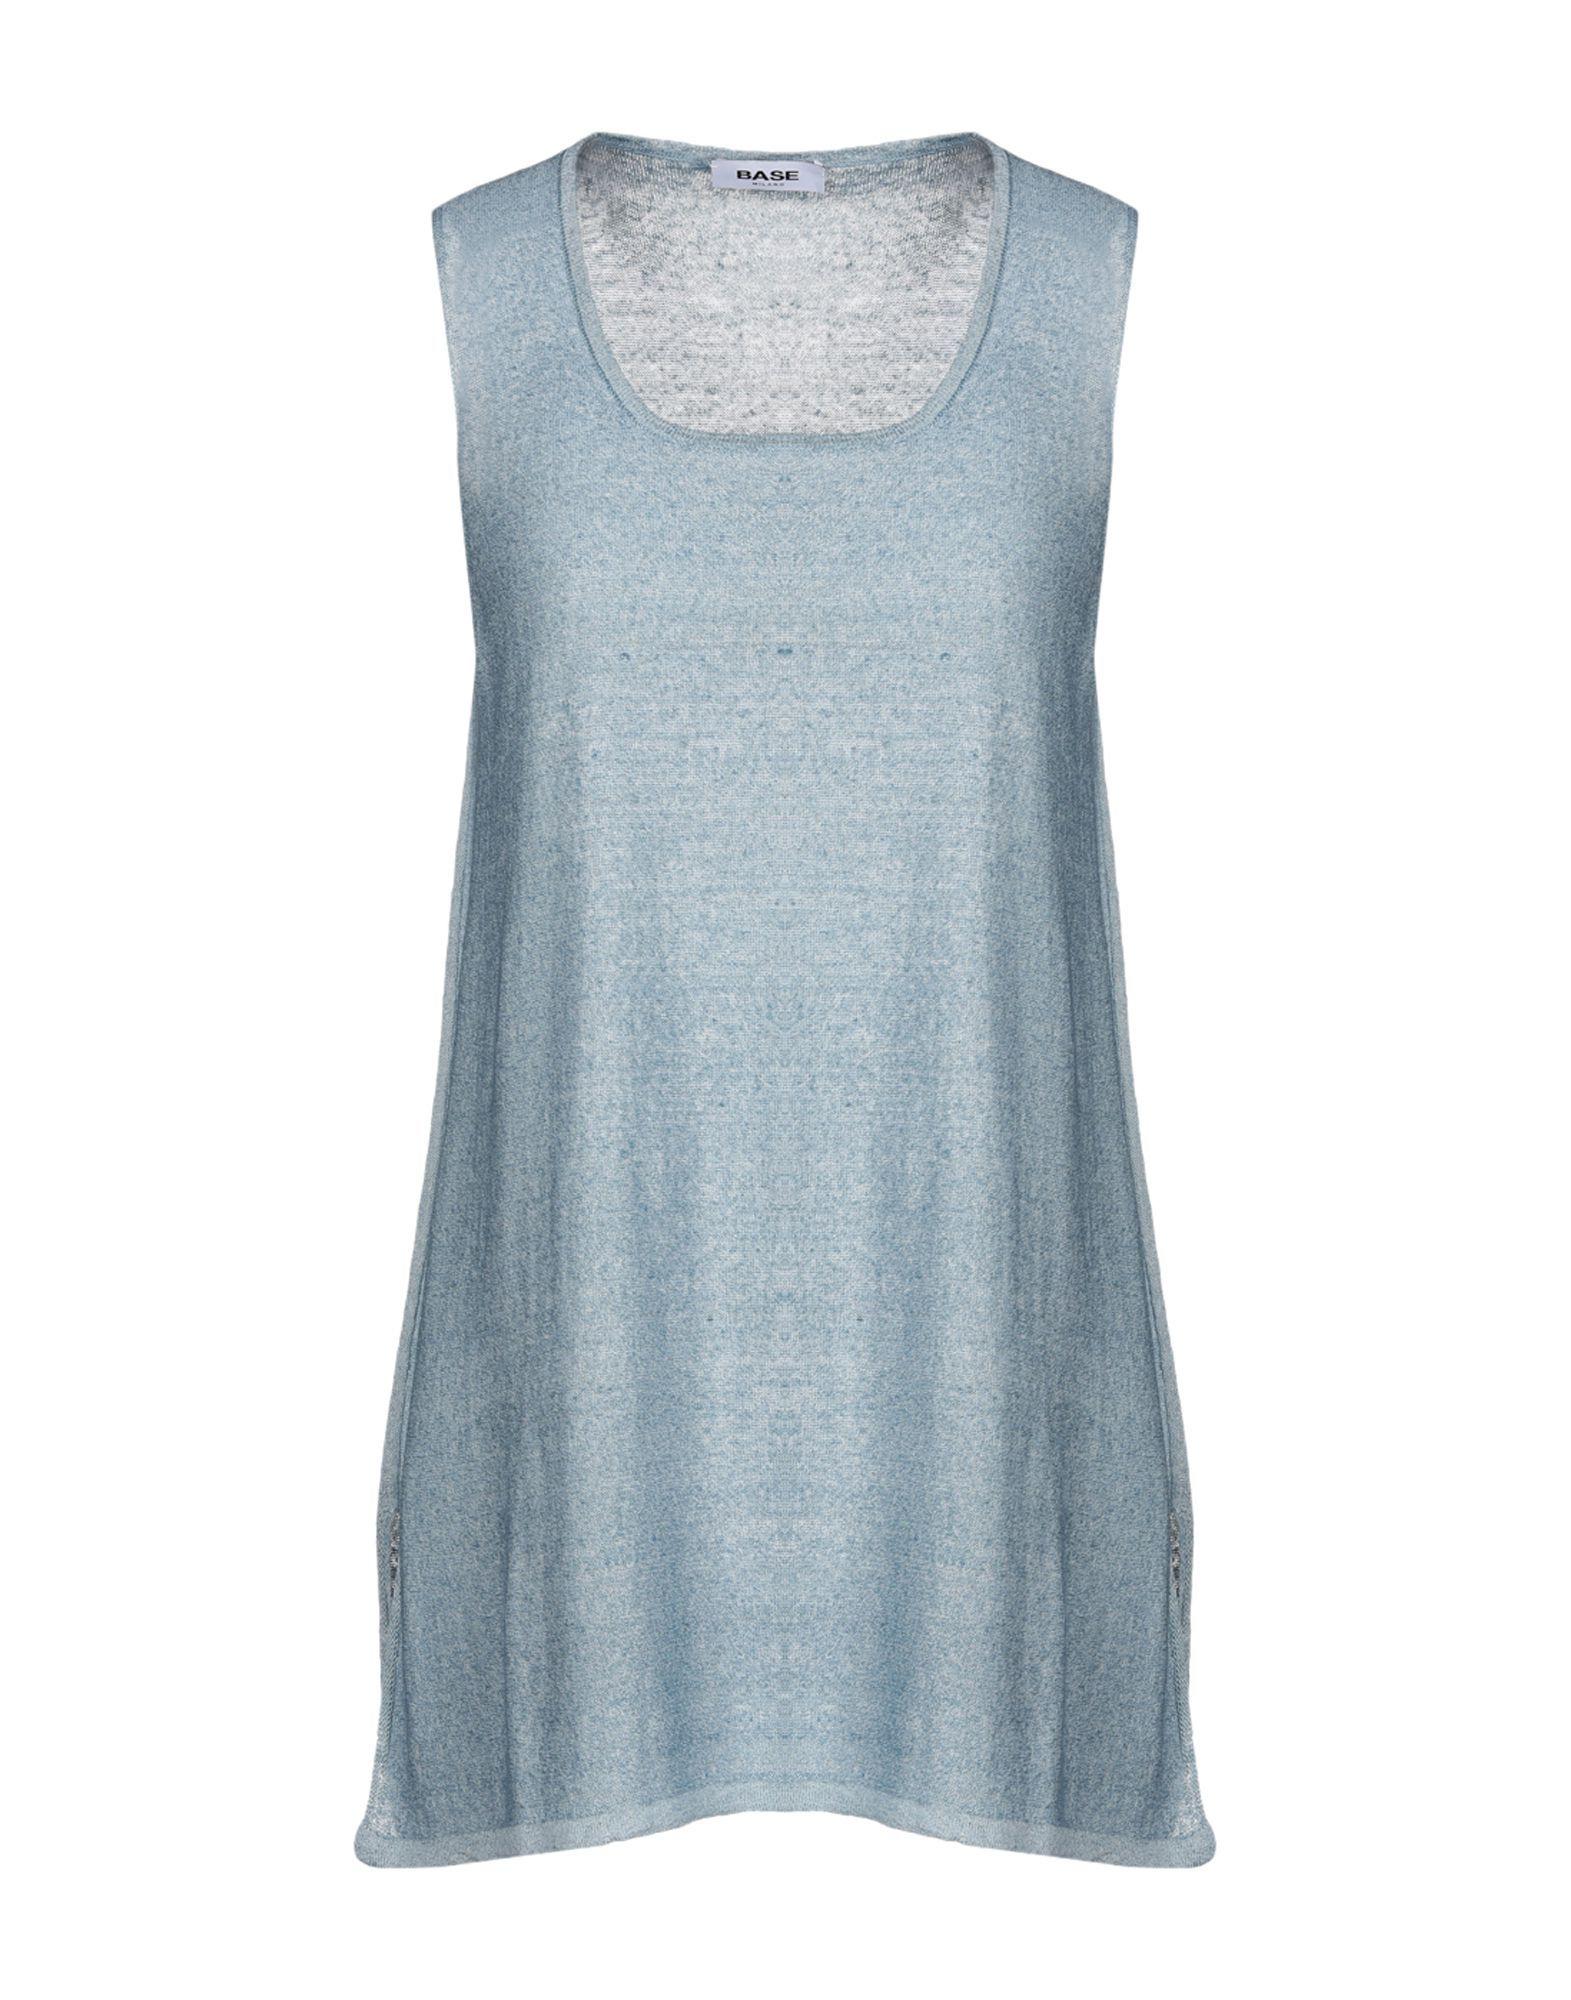 Base Pastel Blue Linen Knit Tank